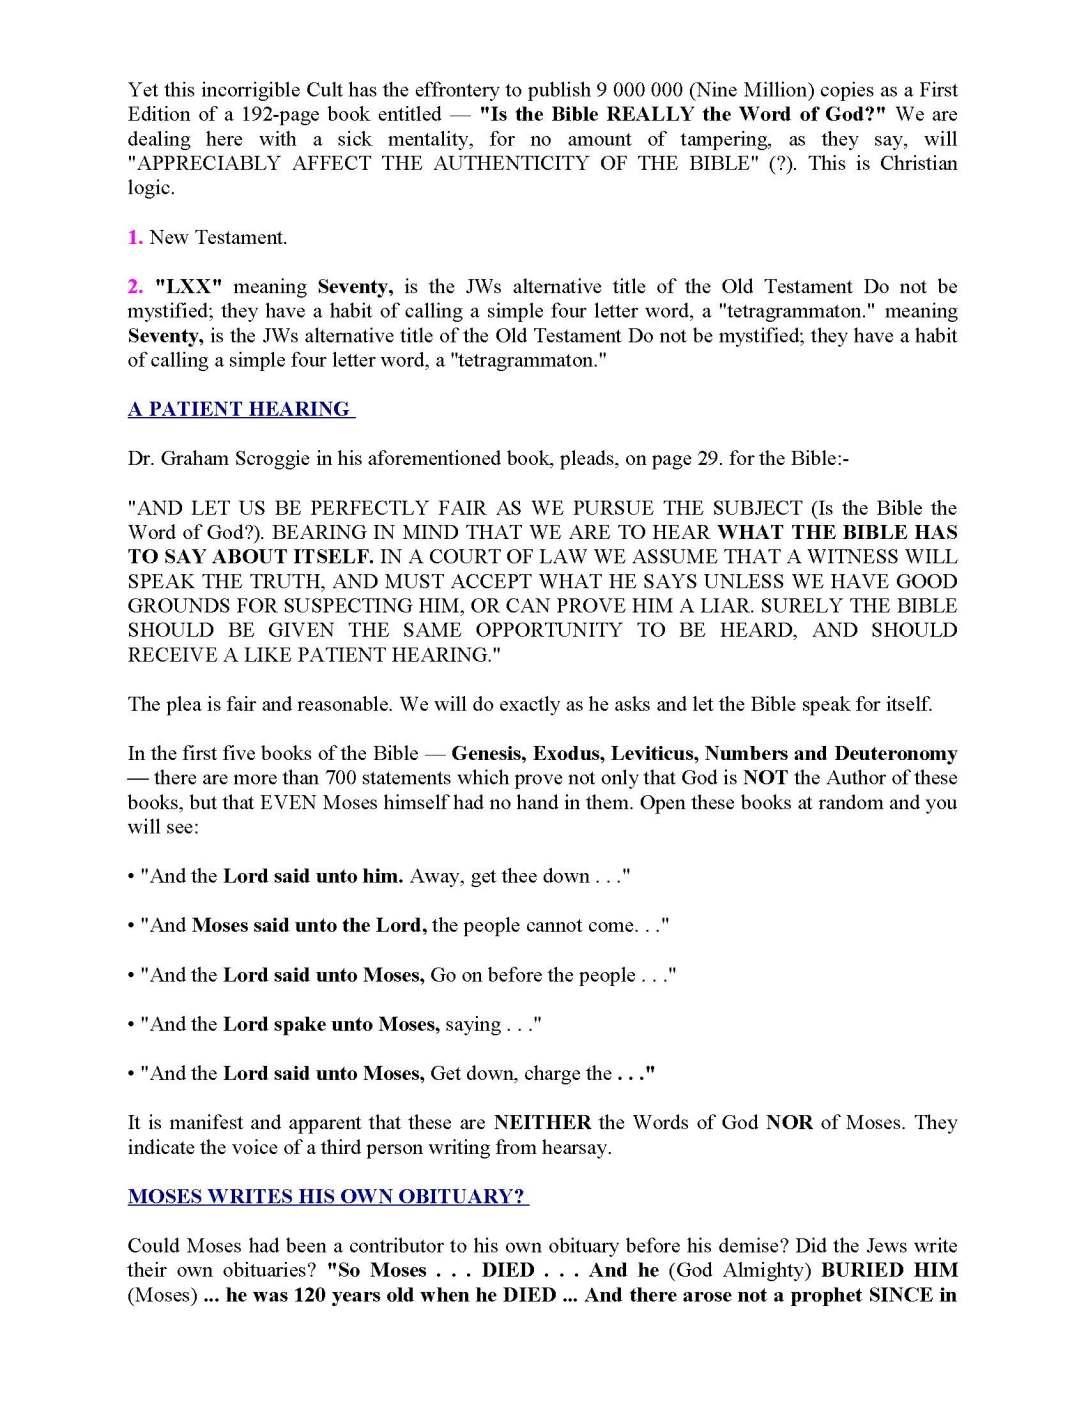 Is The Bible Gods Word [deedat]_Page_19